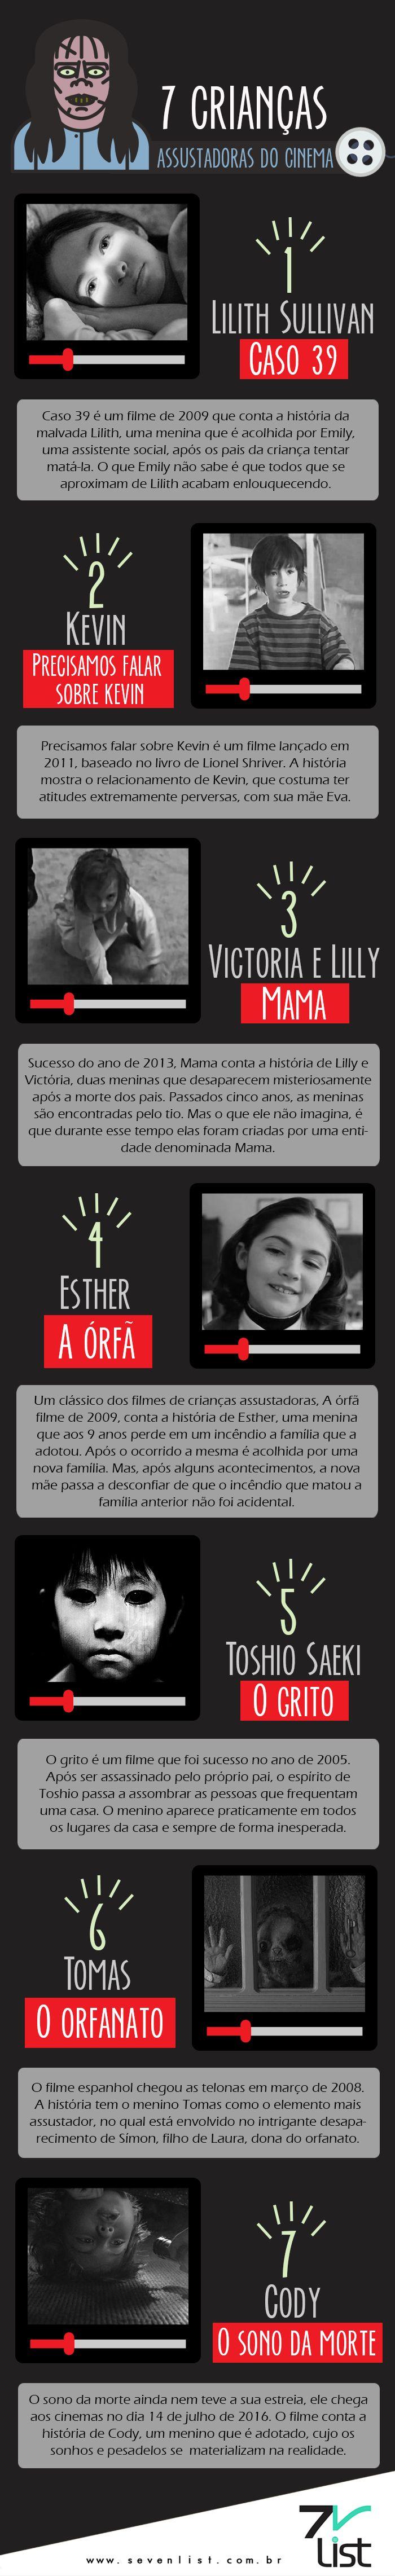 #Design #Cinema #Movie #Filmes #Film #Terror #Entretenimento www.sevenlist.com.br